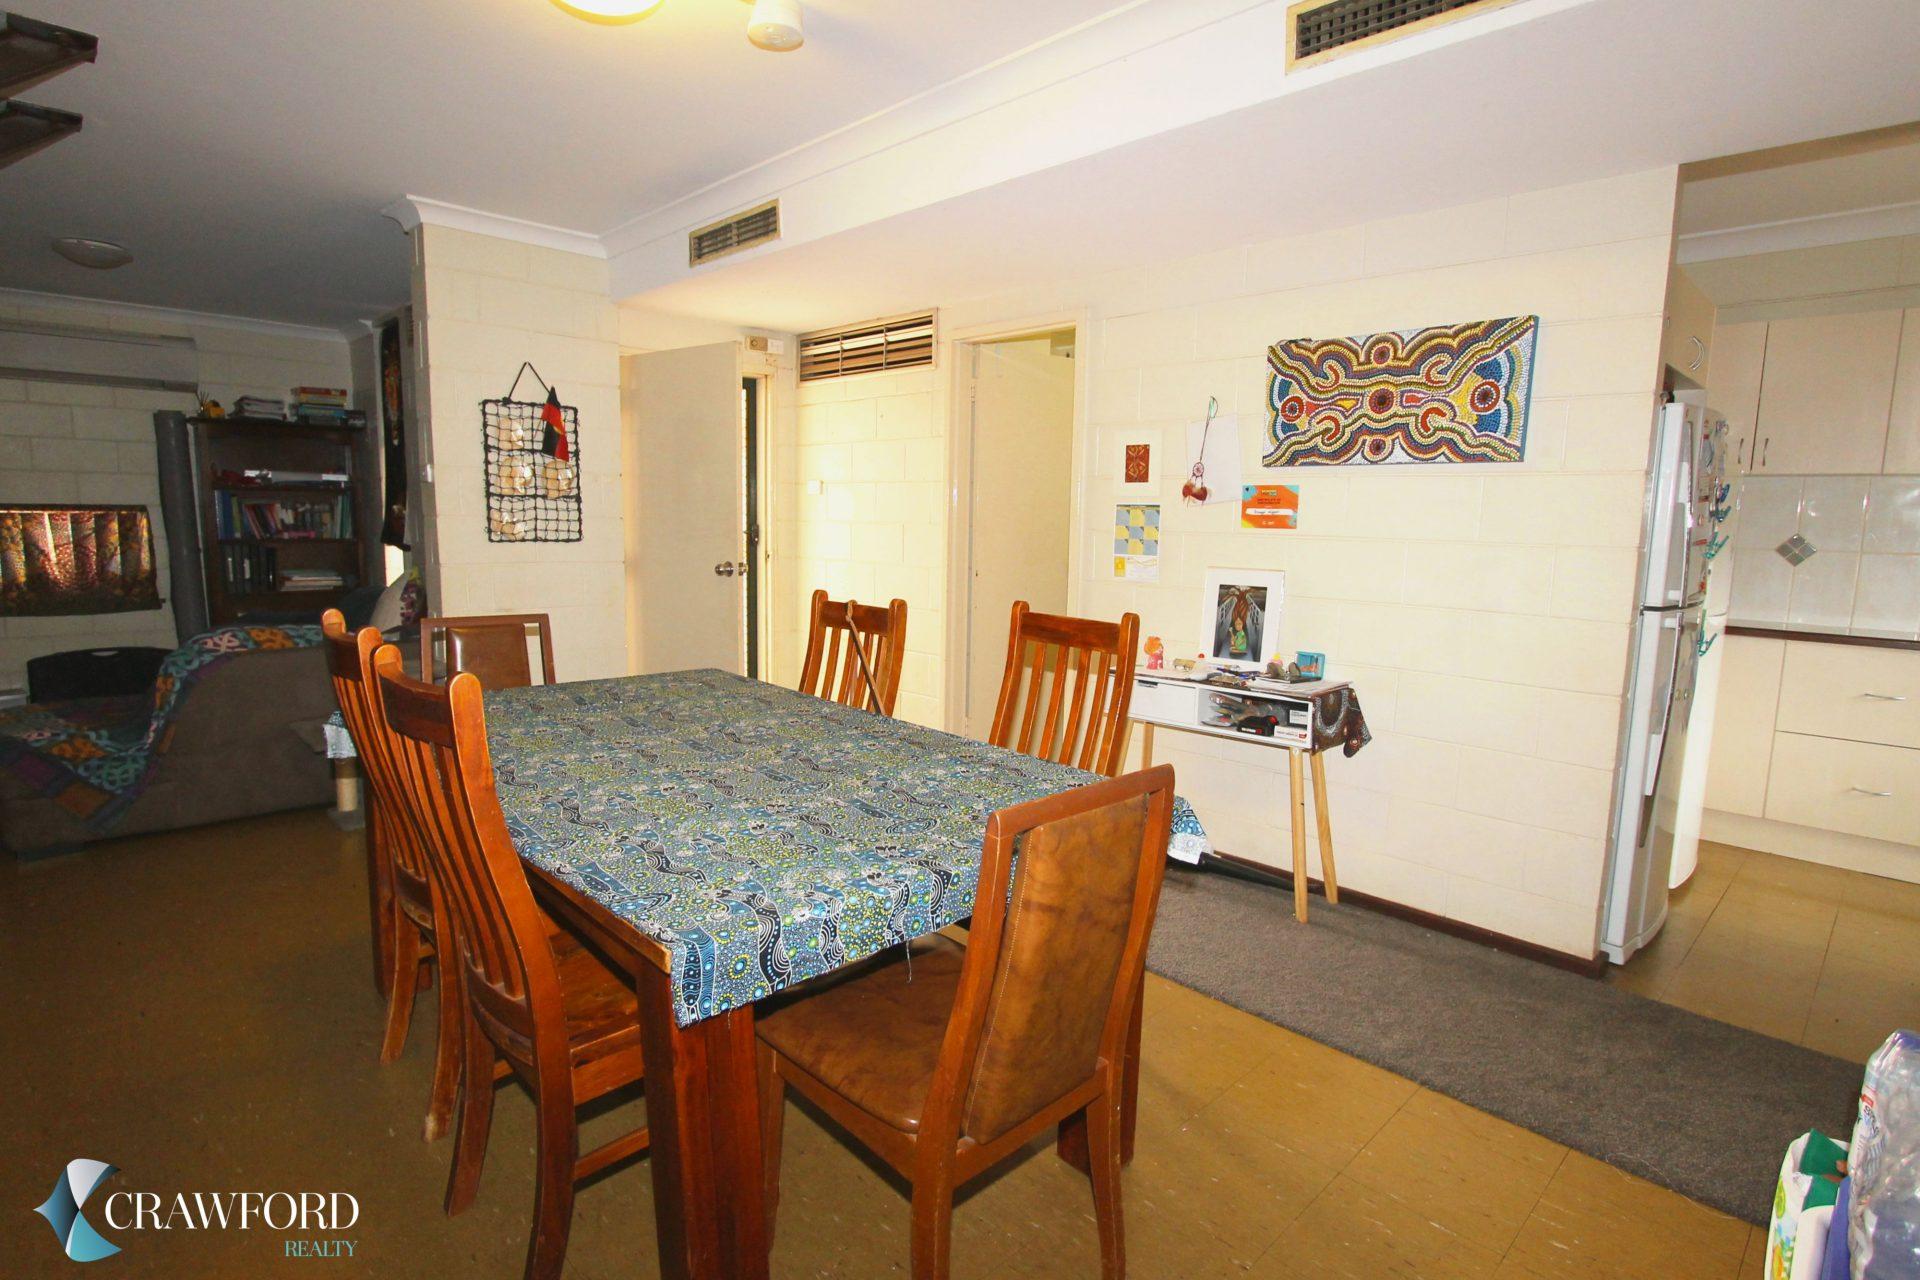 Lounge-Dining-1-_3640502714_20190125061756_original